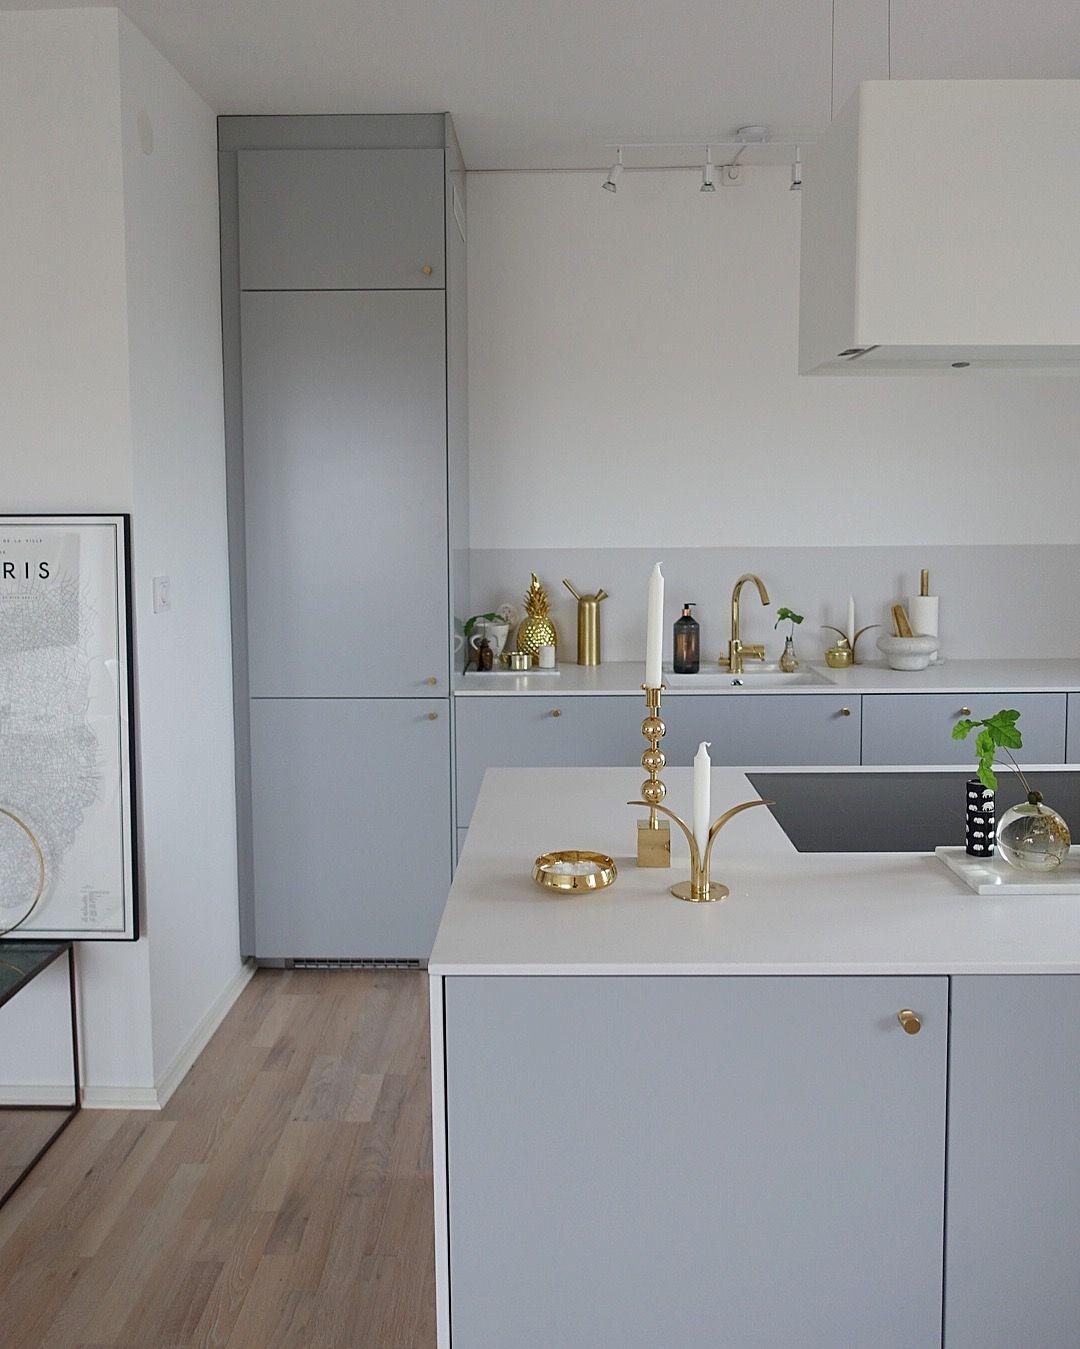 Bildresultat för veddinge grå ikea | We\'ll have a home again one day ...